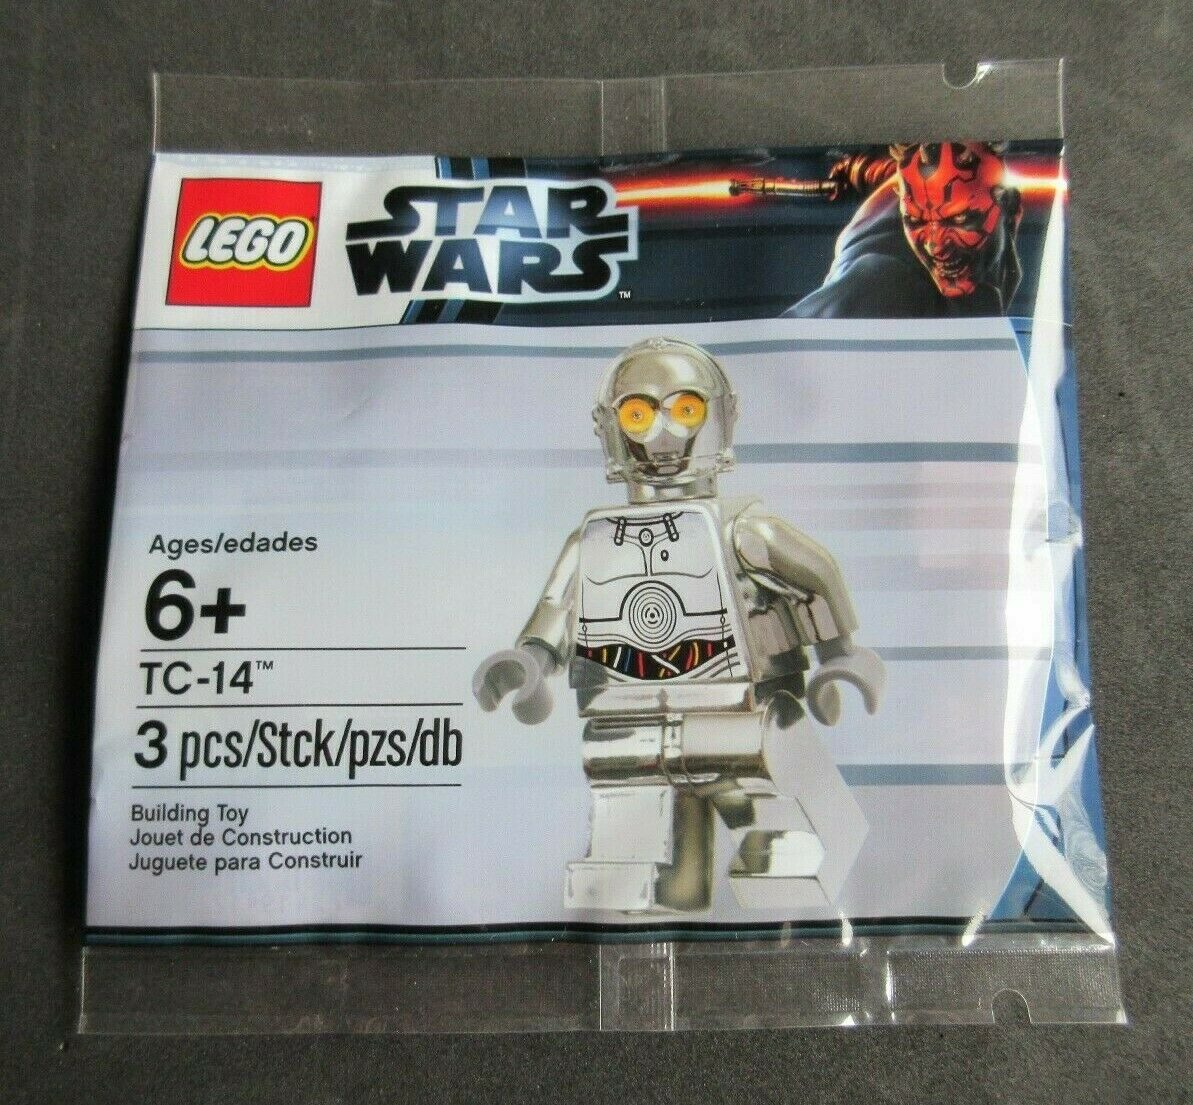 LEGO Star Wars Set 5000063 Chrome TC-14 Polybag (New (New (New & Sealed) ccf1f3